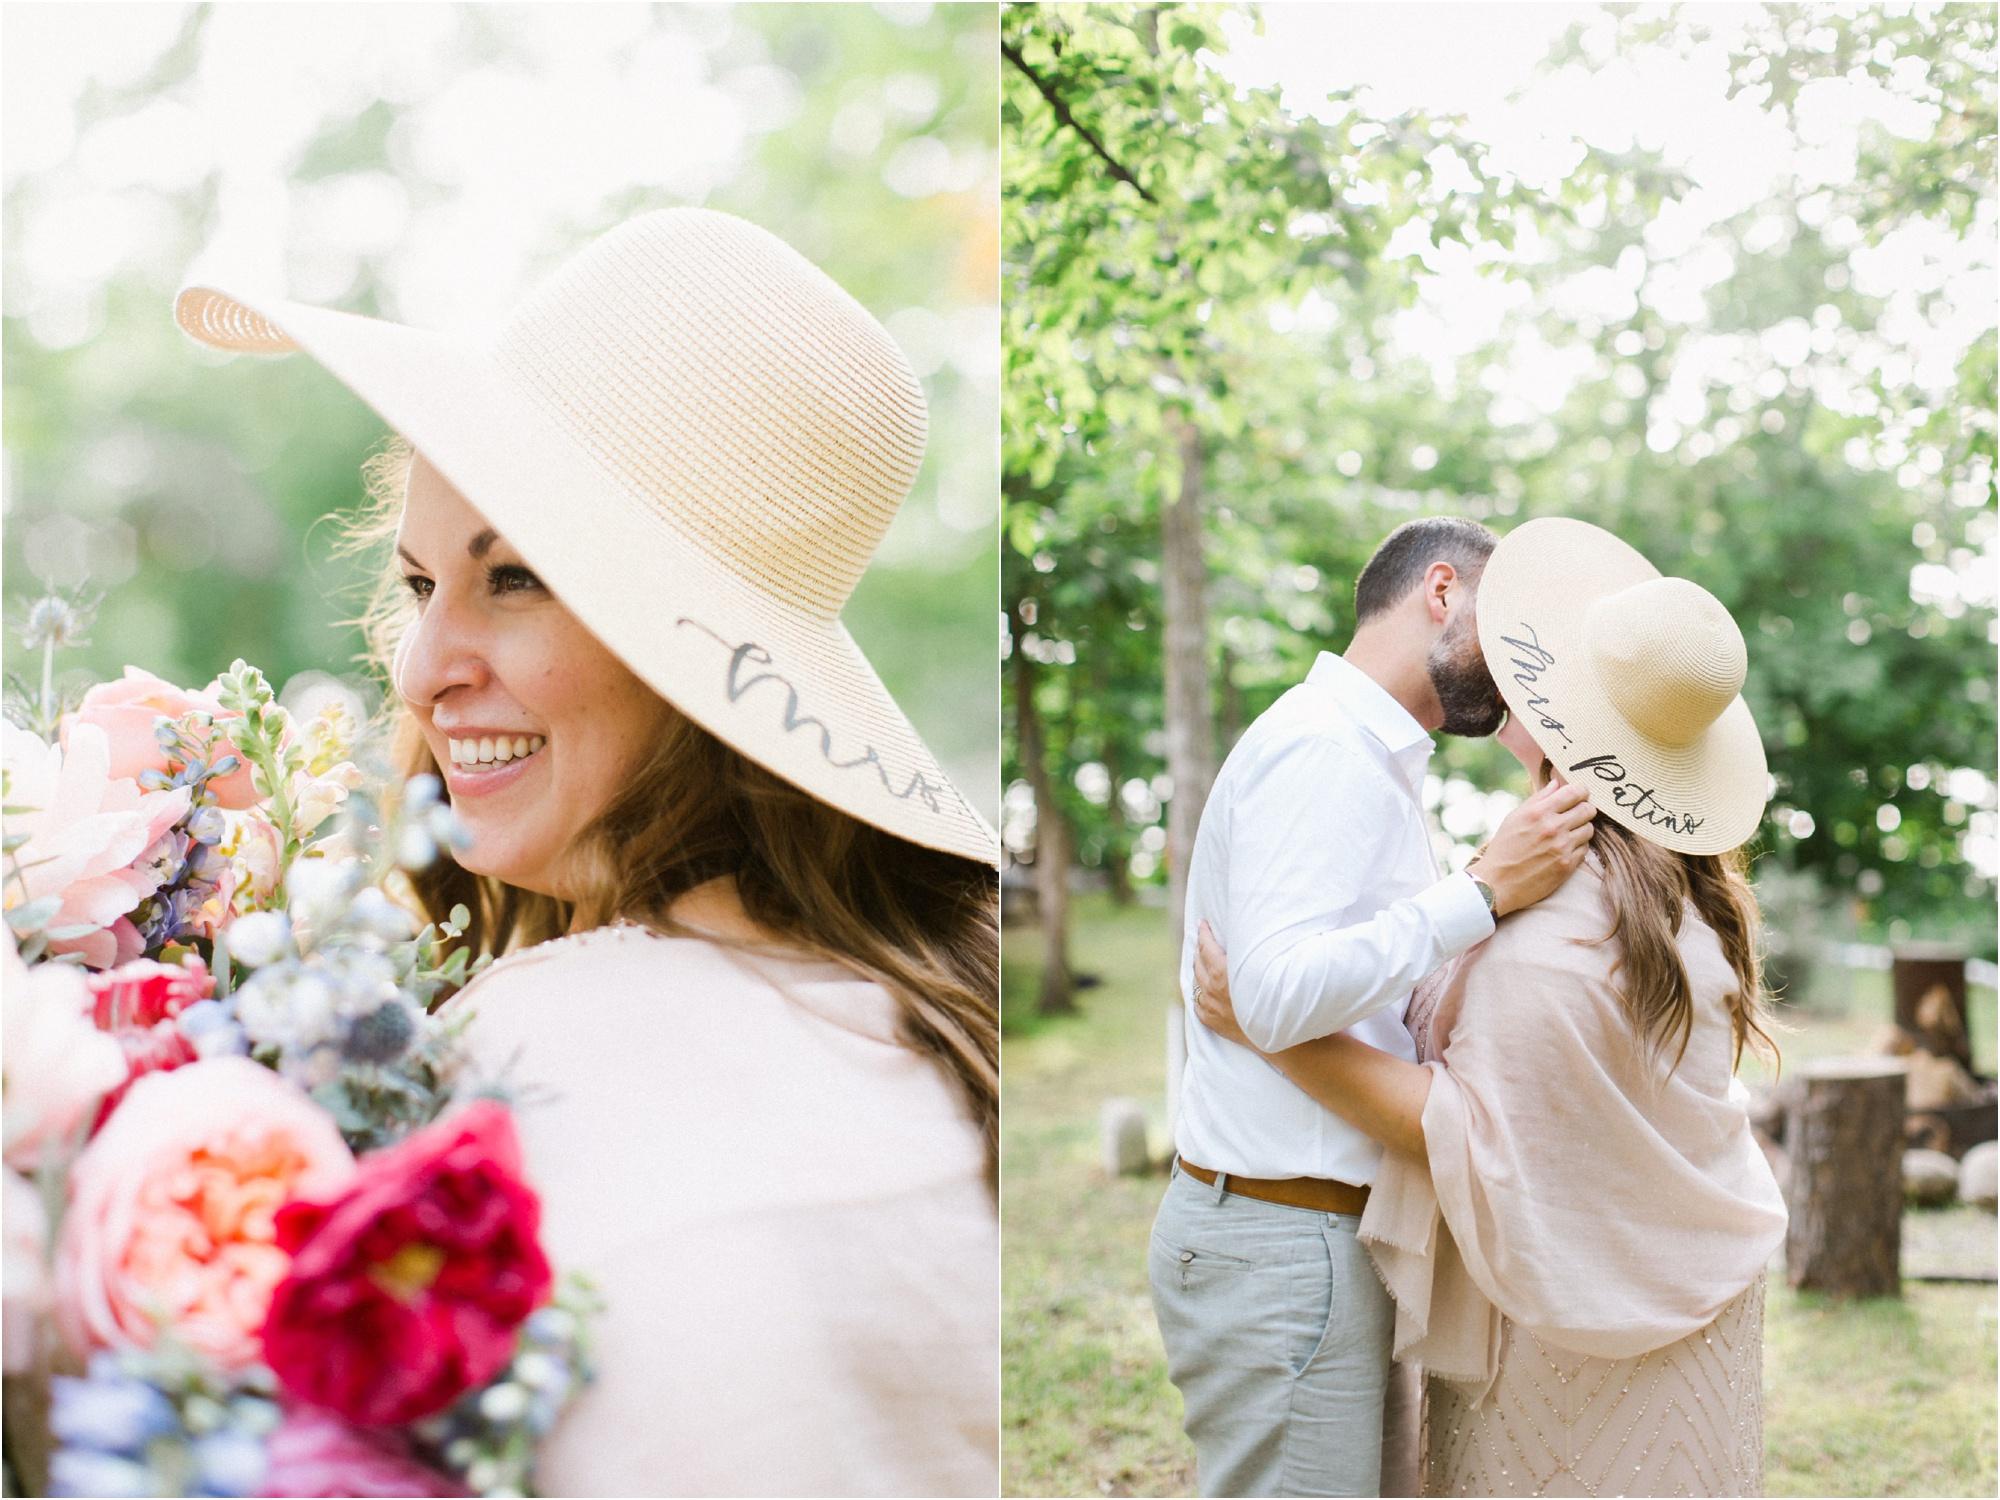 Wedding Photography Brainerd MN Aimee Jobe Photography Private Lake Residence Bloom Designs_0094.jpg